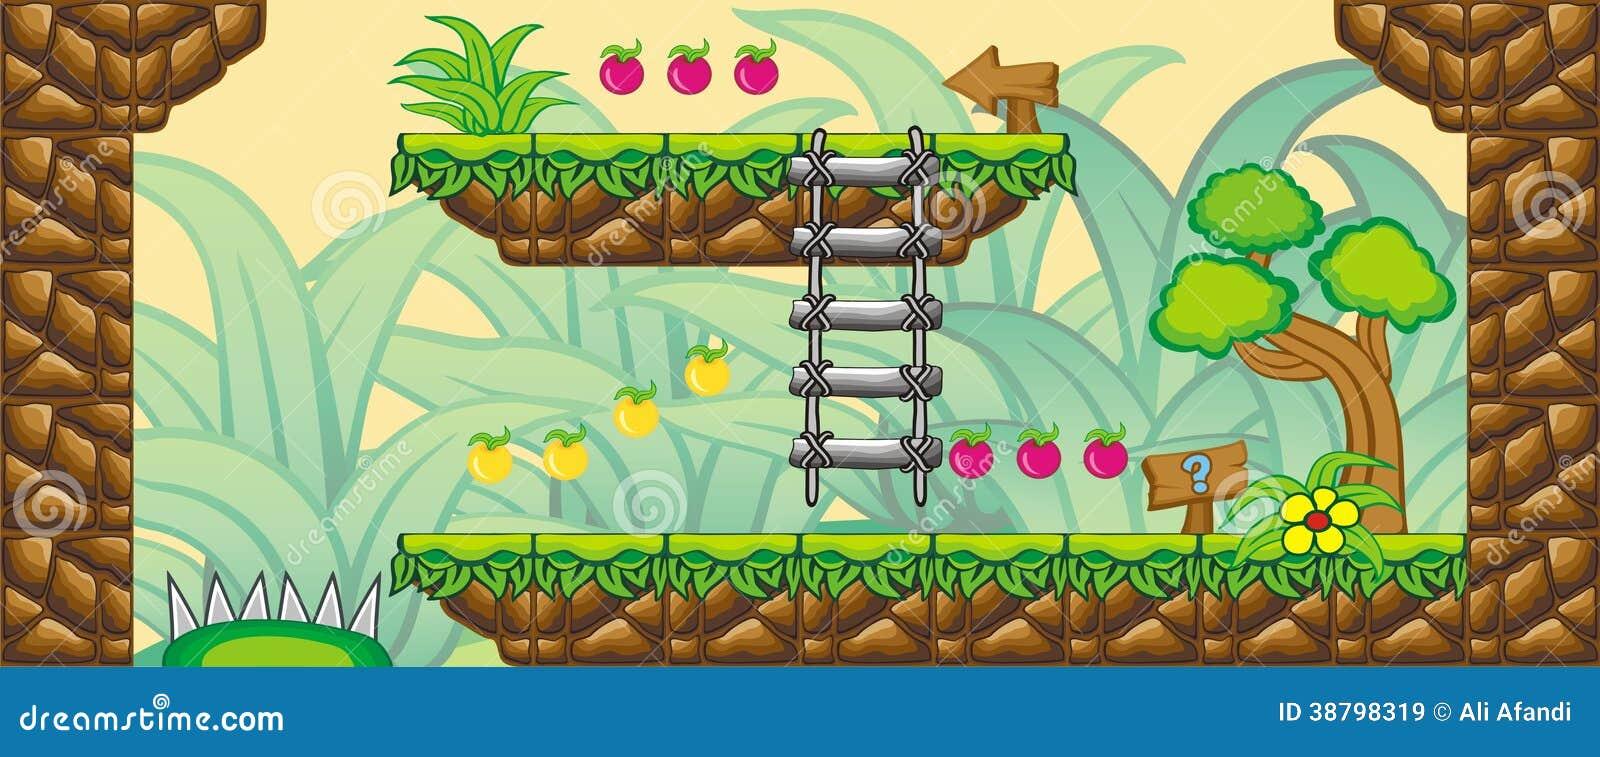 2D Tileset Platform Game 12 Stock Illustration